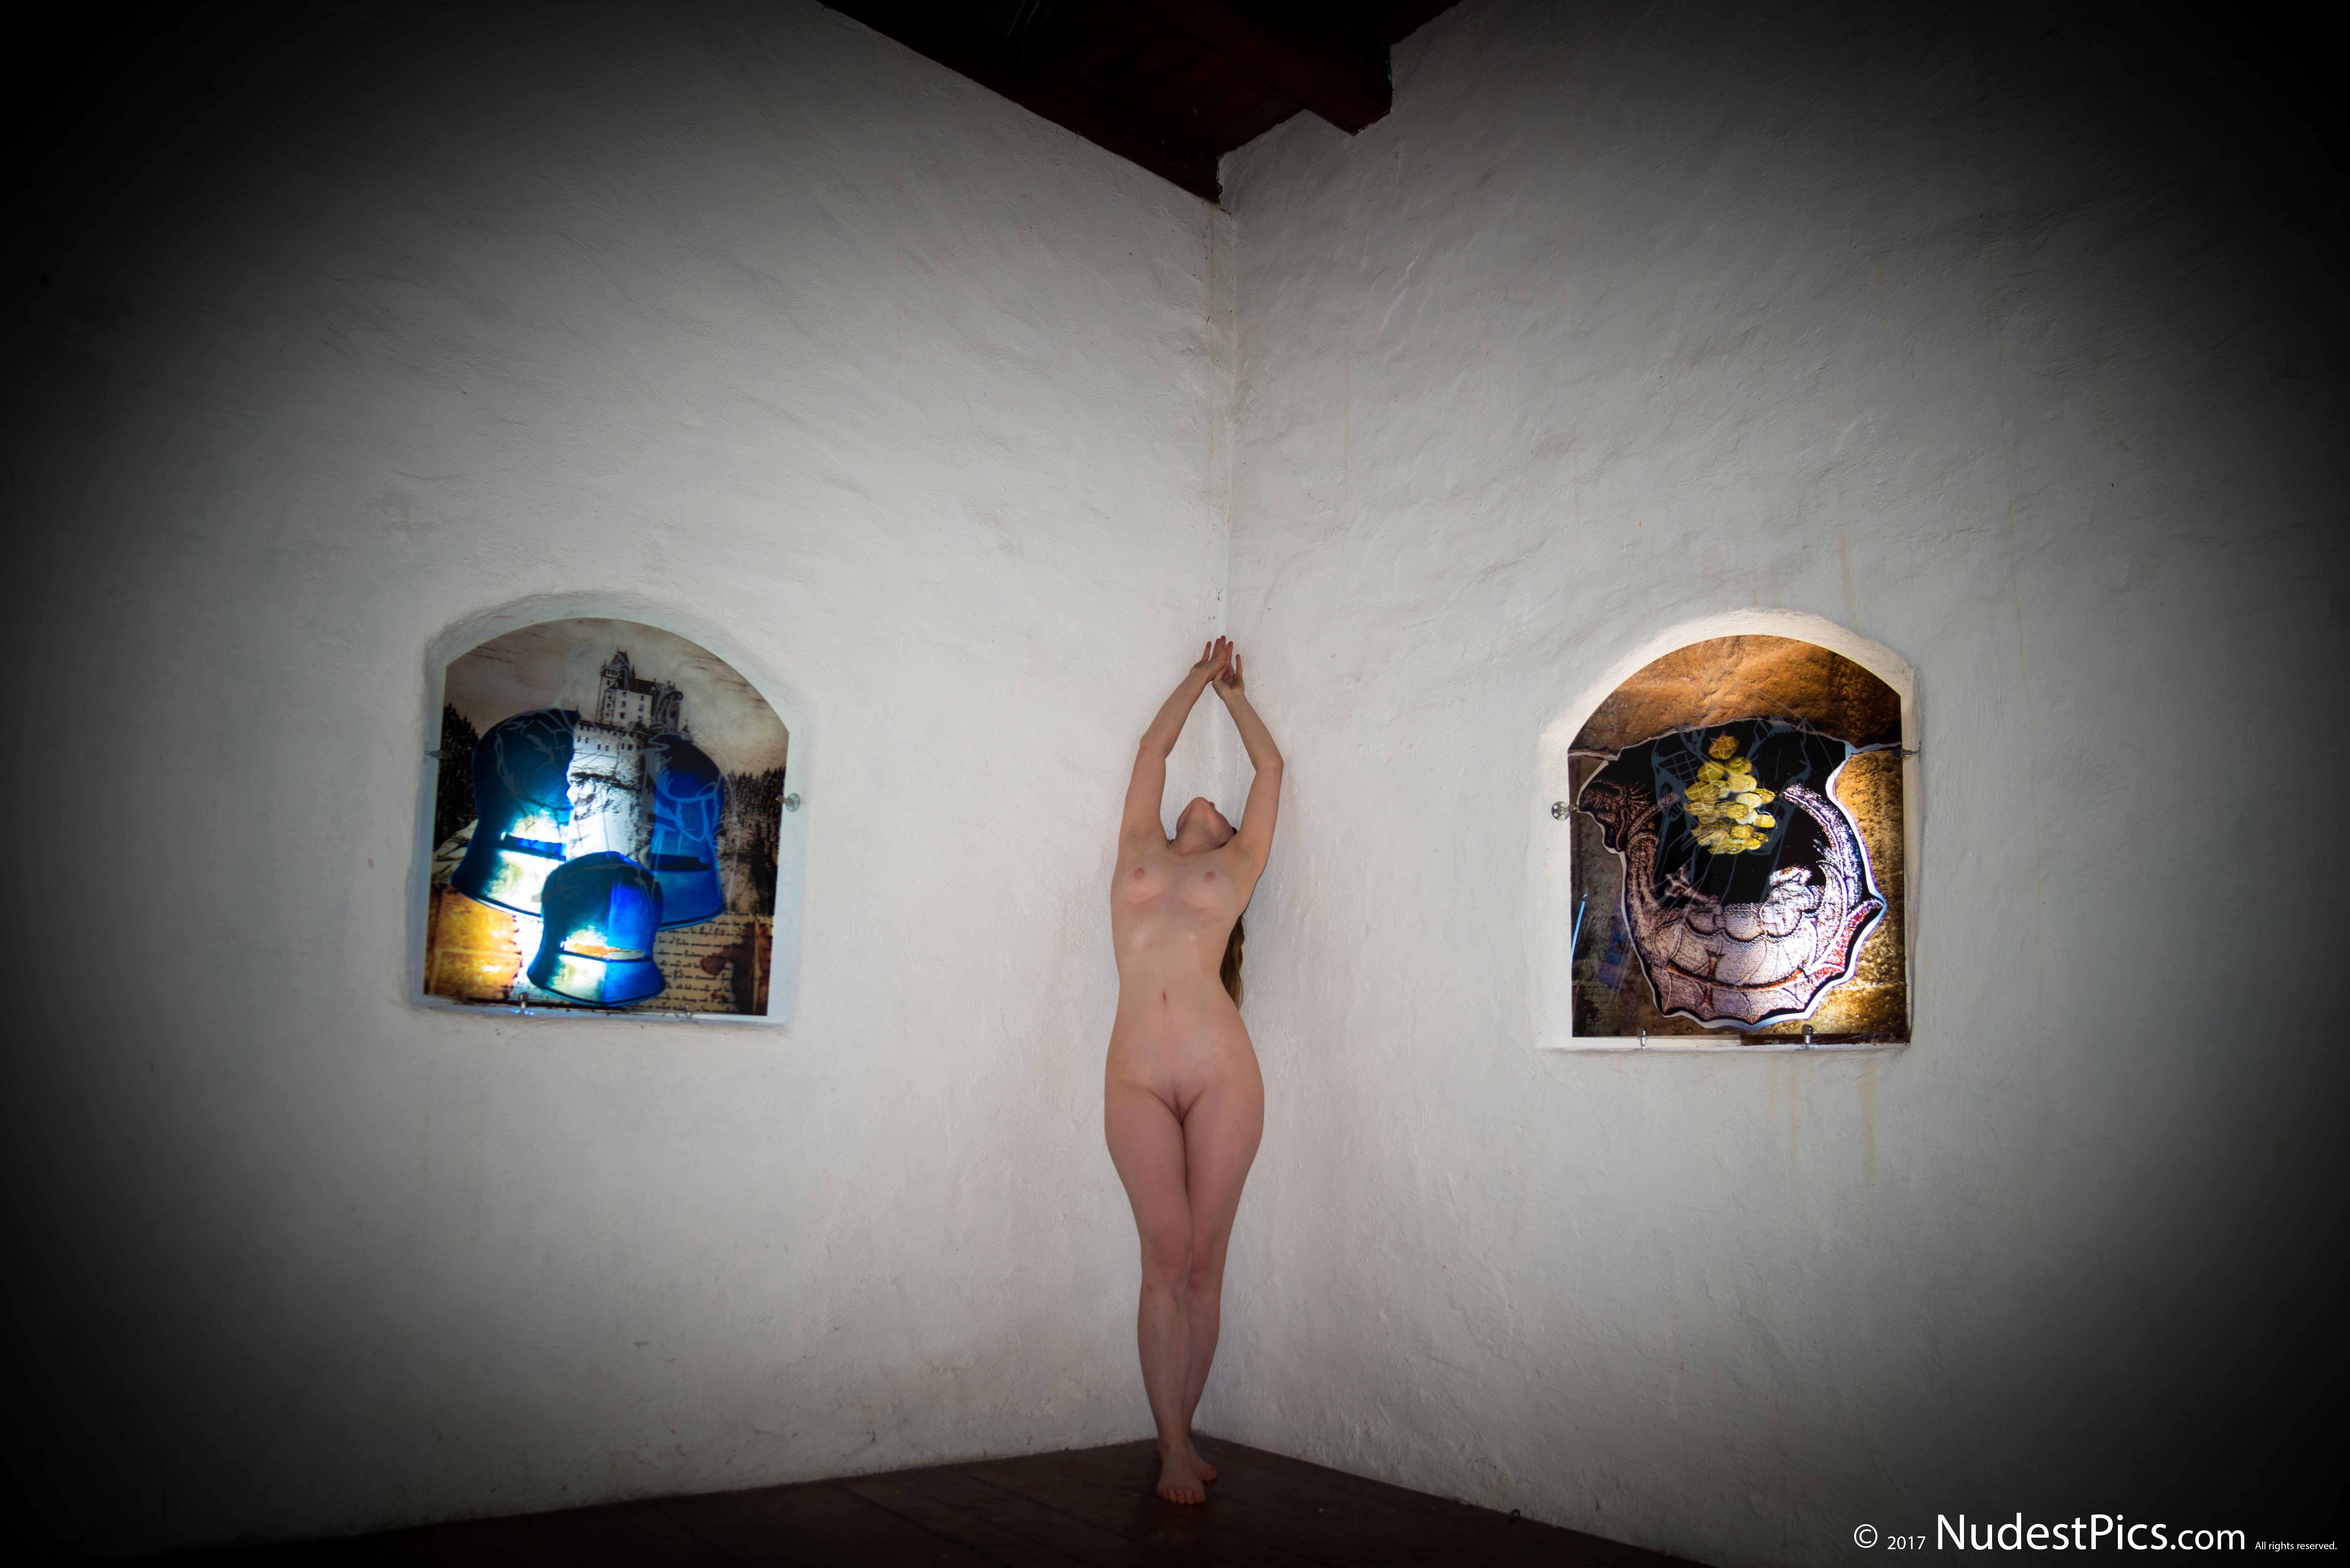 Artist Girl Posing Nude in the Art Museum HD